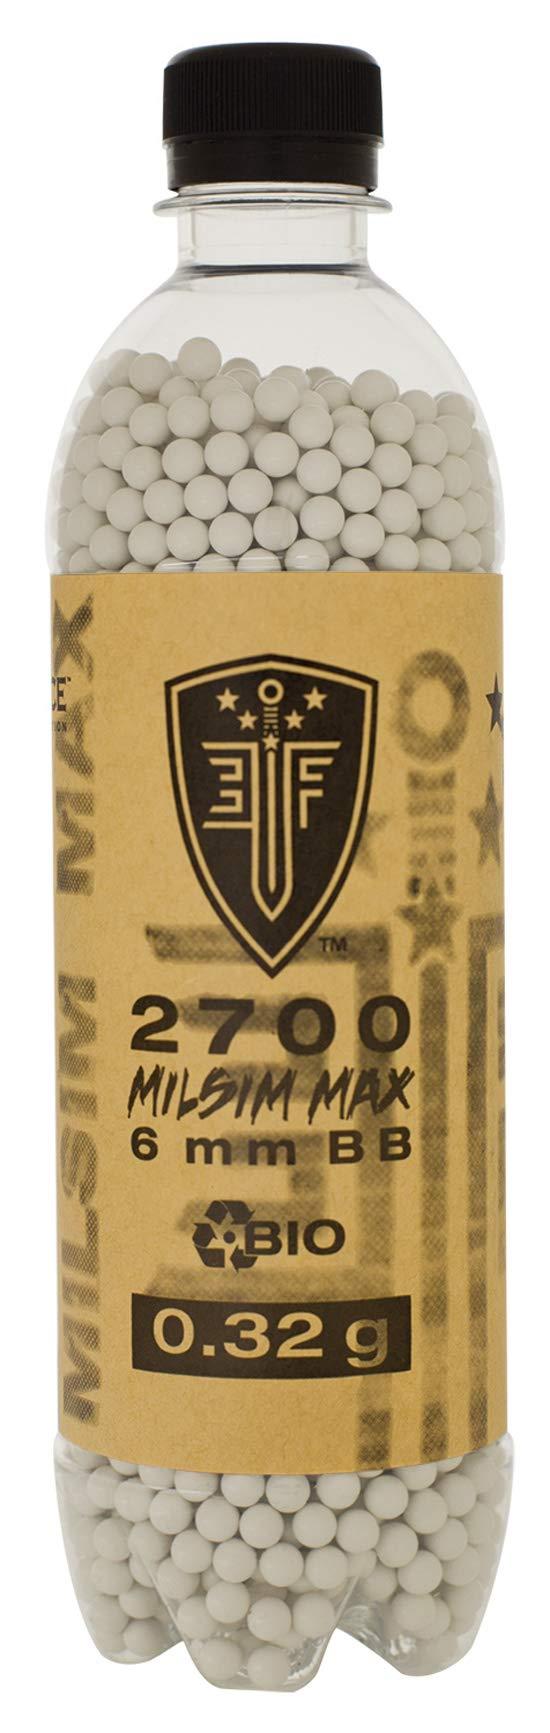 Elite Force Premium Biodegradable 6mm Airsoft BBS Ammo.25 Gram, 2700 Count